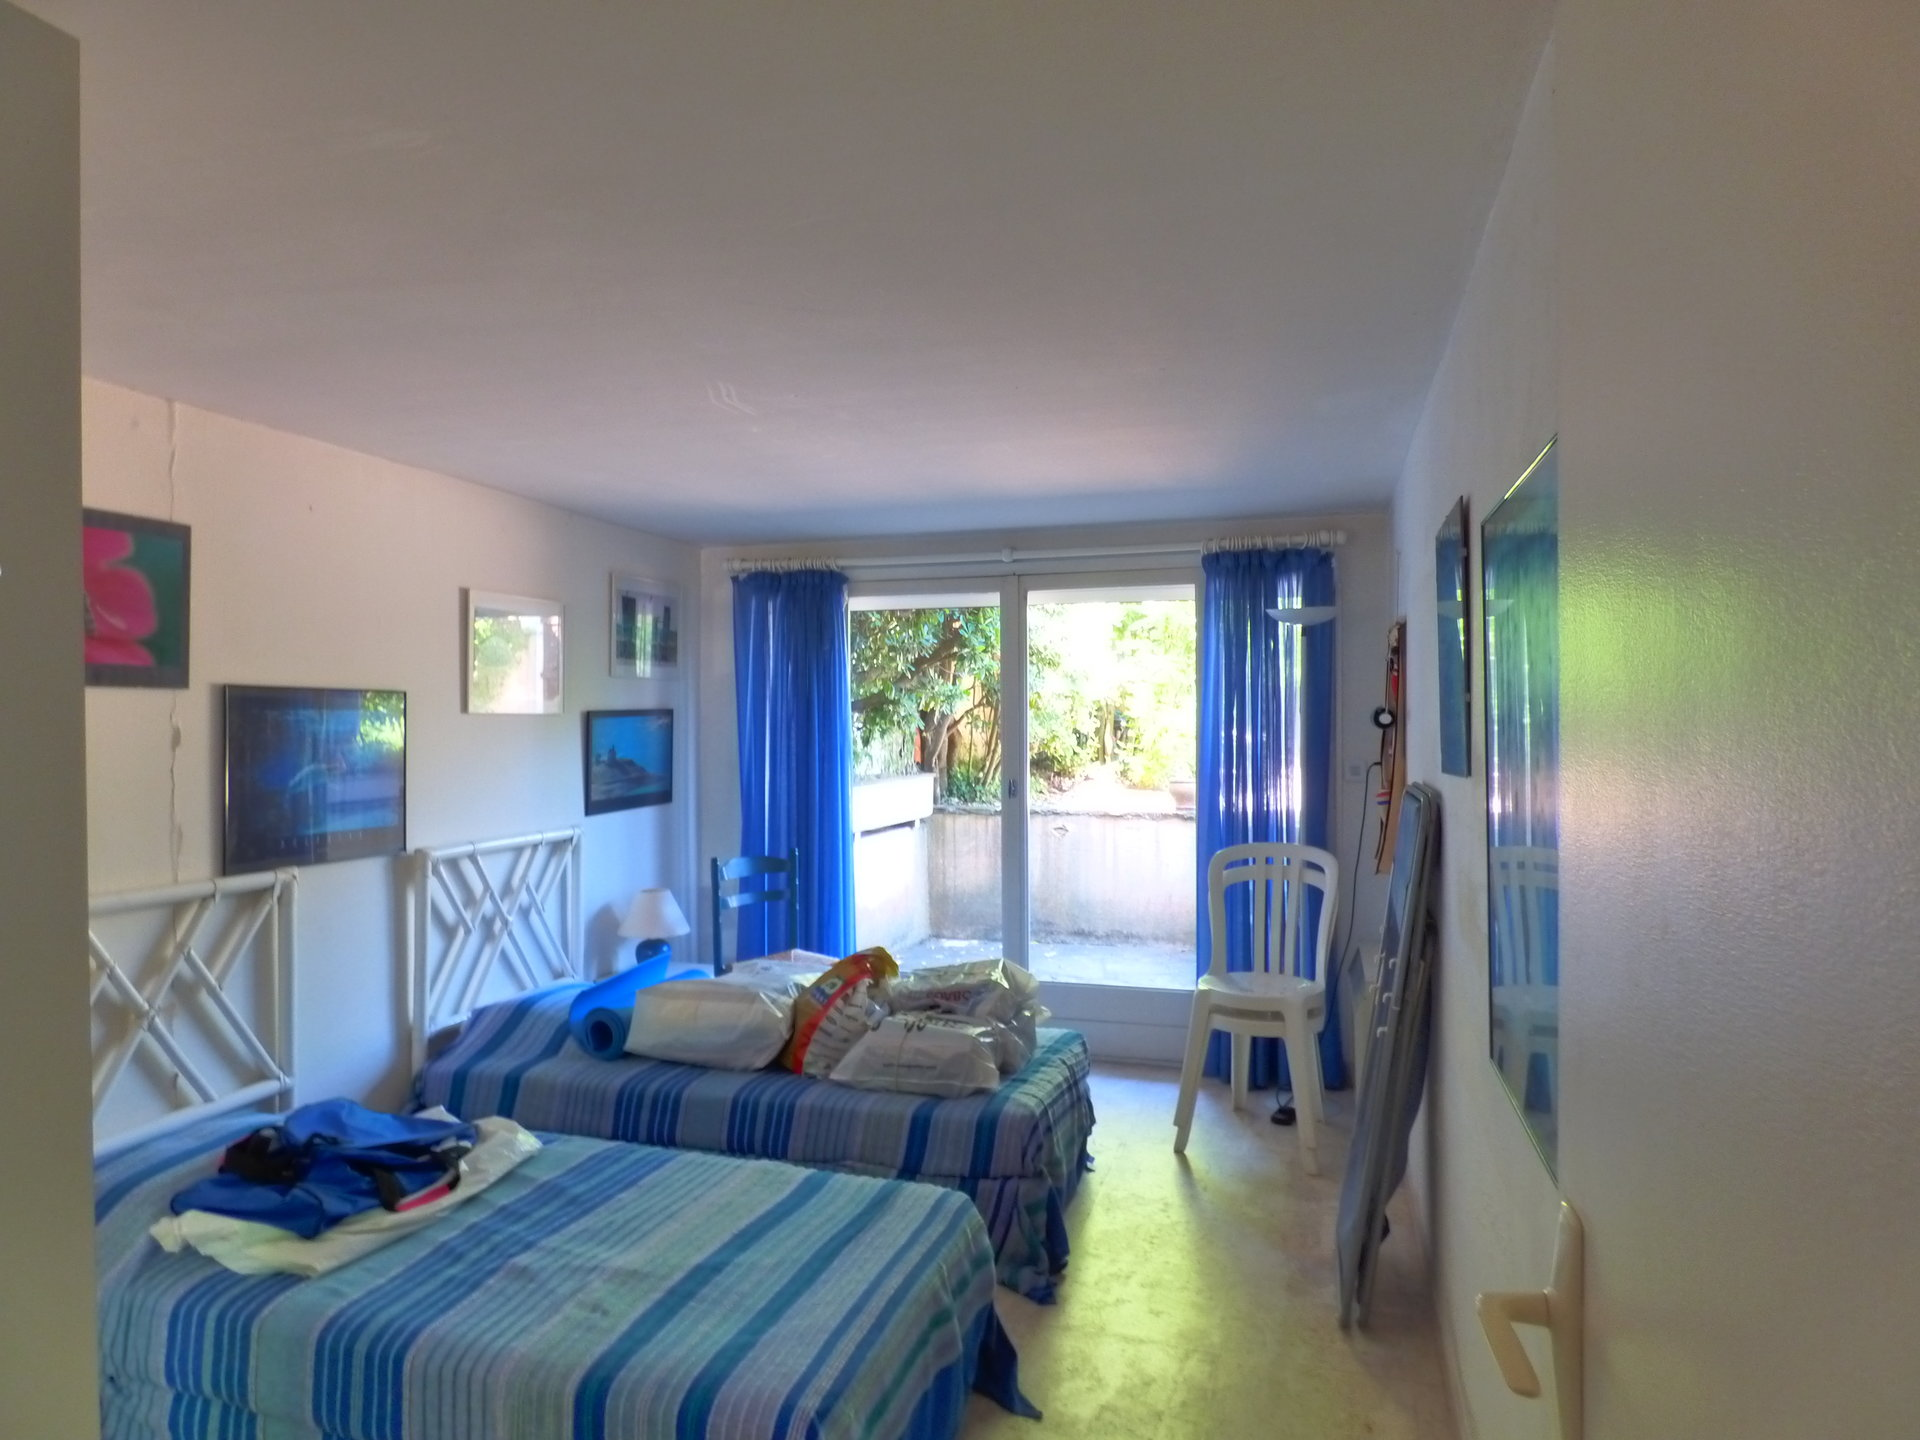 BIOT Proche Sophia House 5 rooms 102 m2